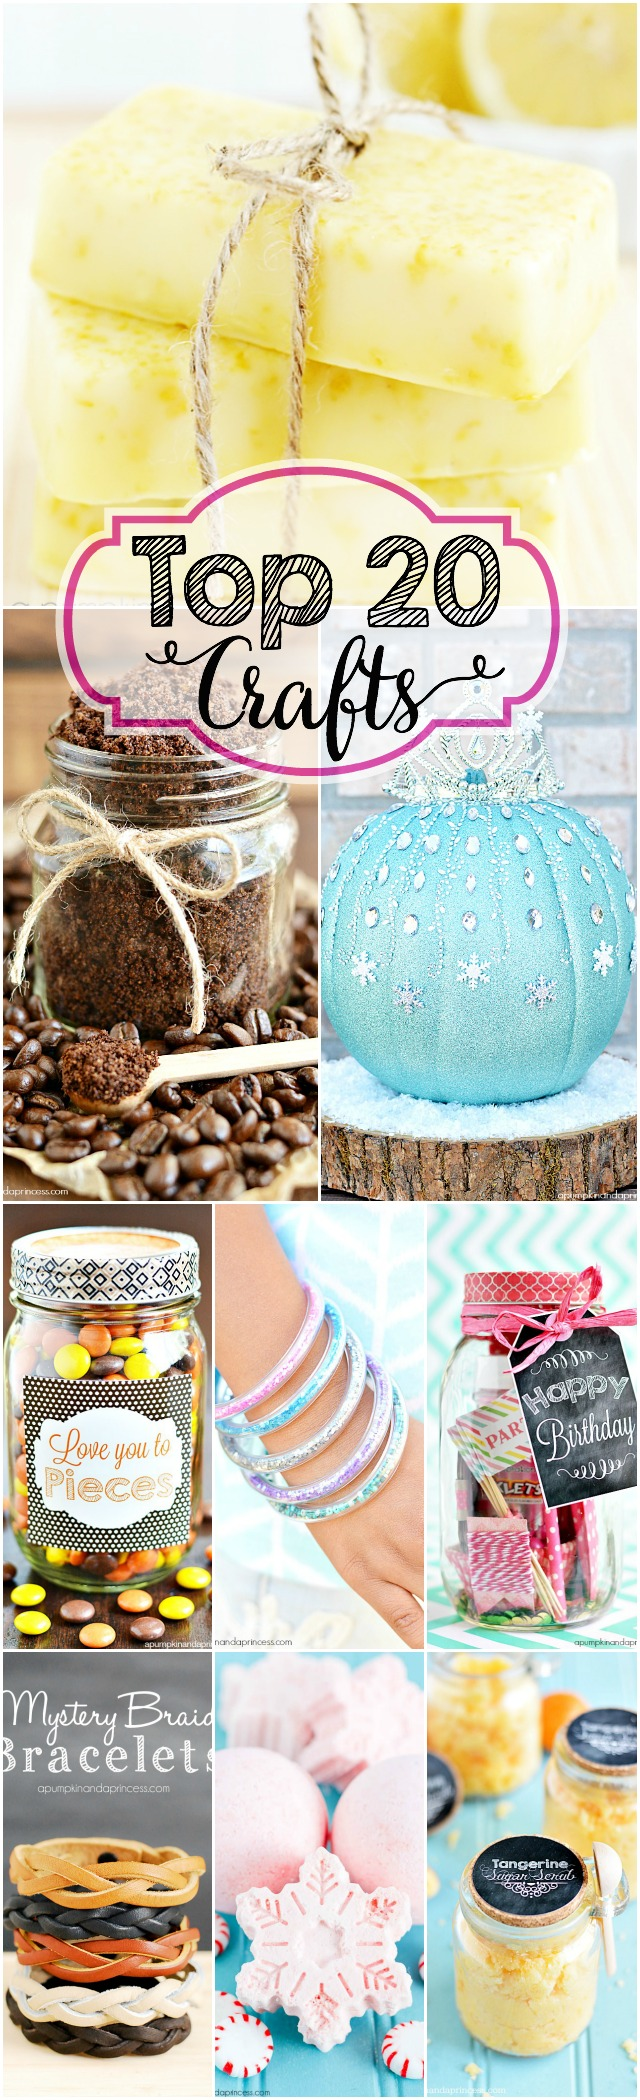 Top 20 Craft Ideas